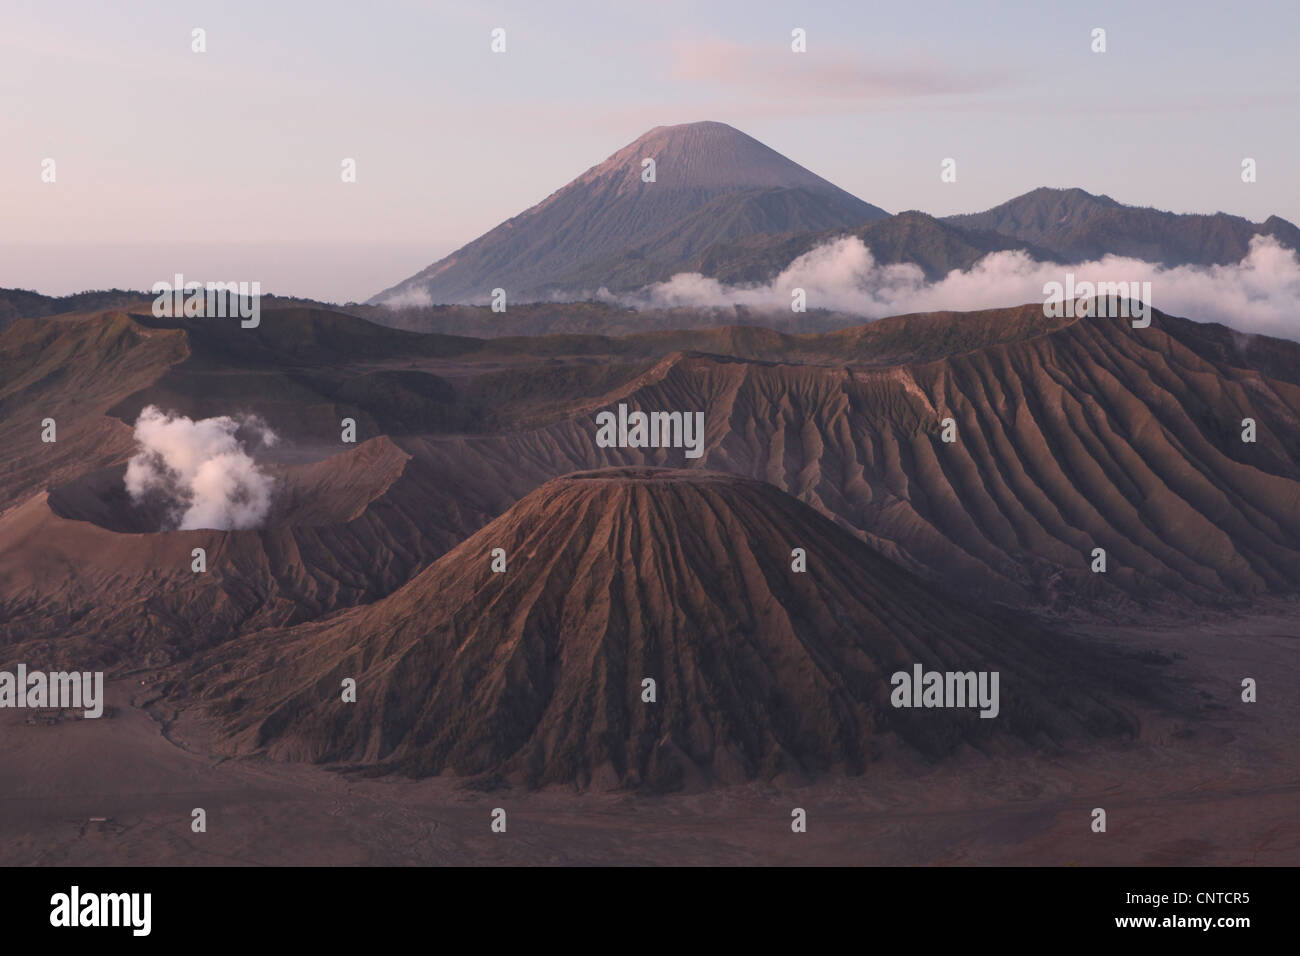 Volcanoes inside the Tengger Caldera in East Java, Indonesia. - Stock Image